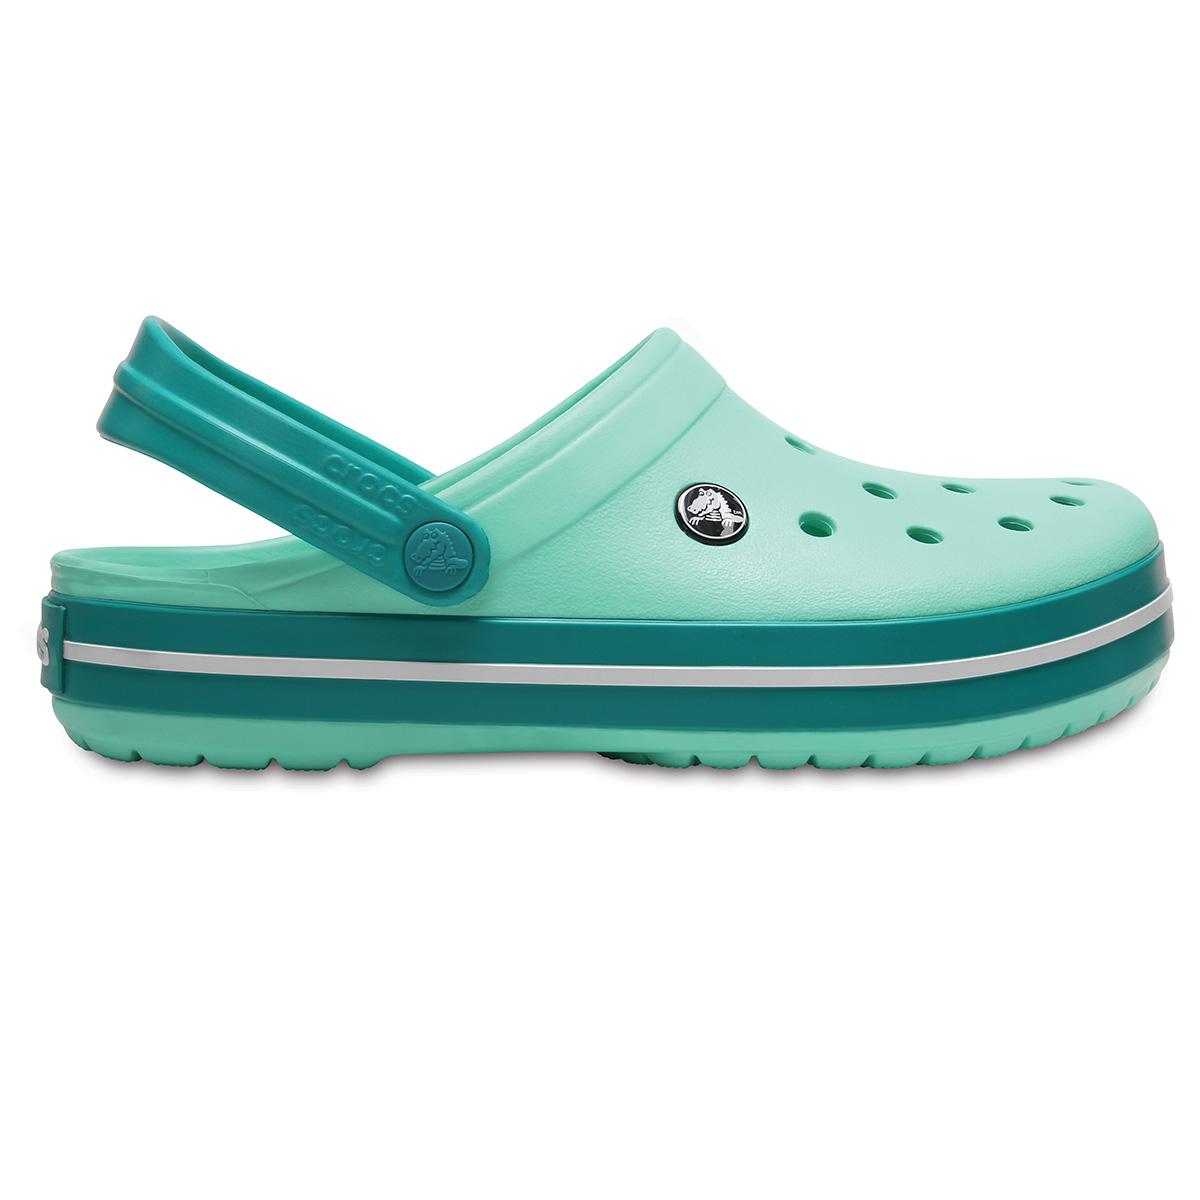 Crocs Crocband - Yeni Mint/Tropikal deniz mavisi